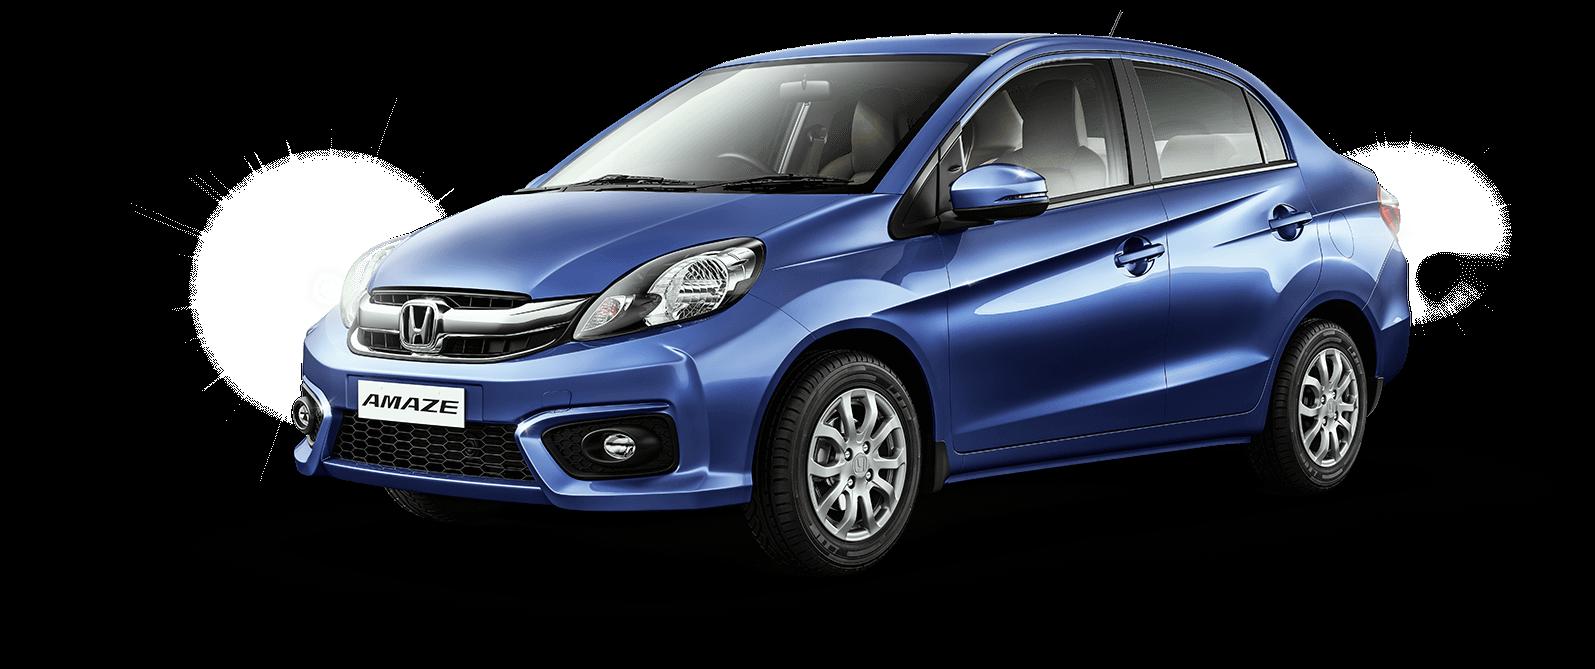 2016 Honda Amaze